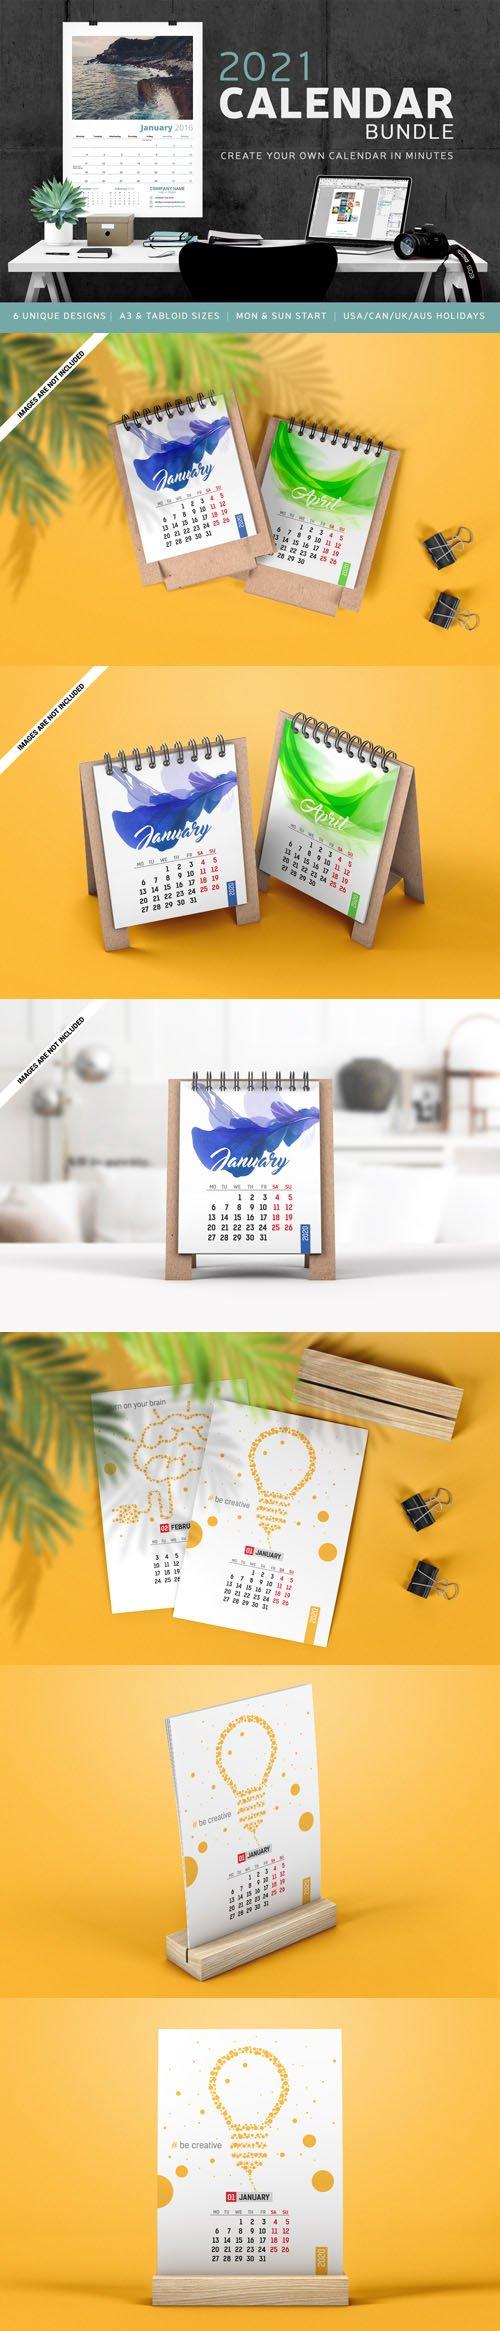 2021 Calendar Bundle - Professional Calendar Grids & Calendars for 2021